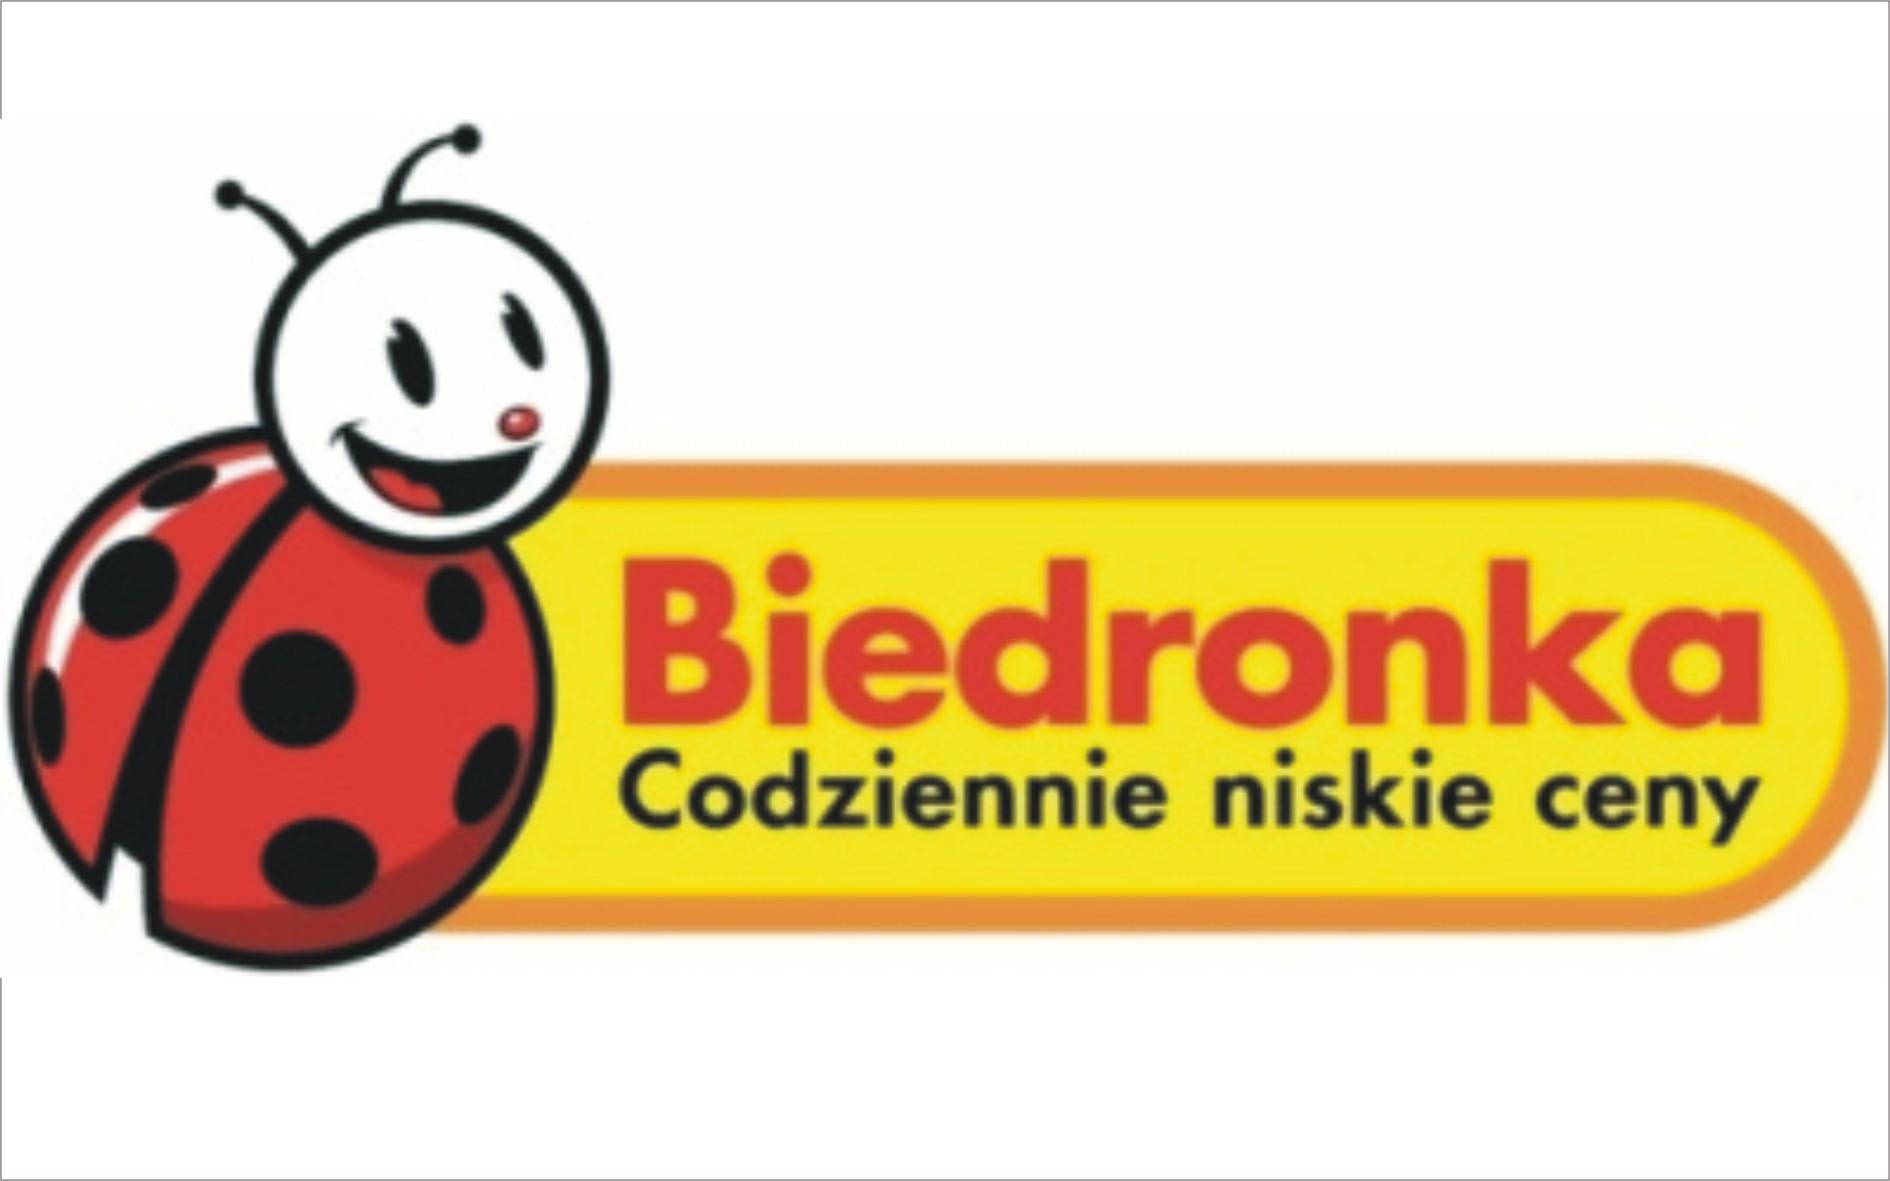 http://www.biedronka.pl/pl